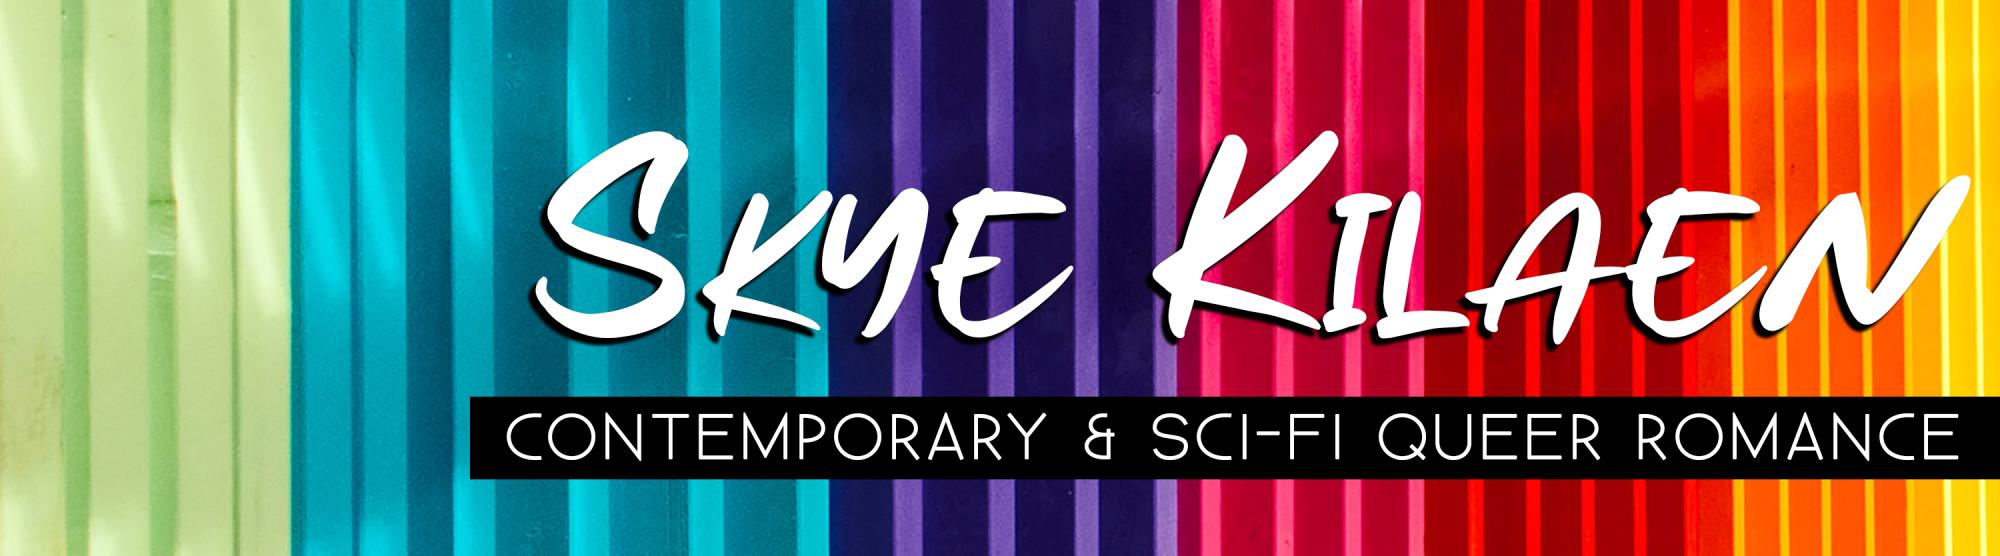 Skye Kilaen Writes Queer Romance